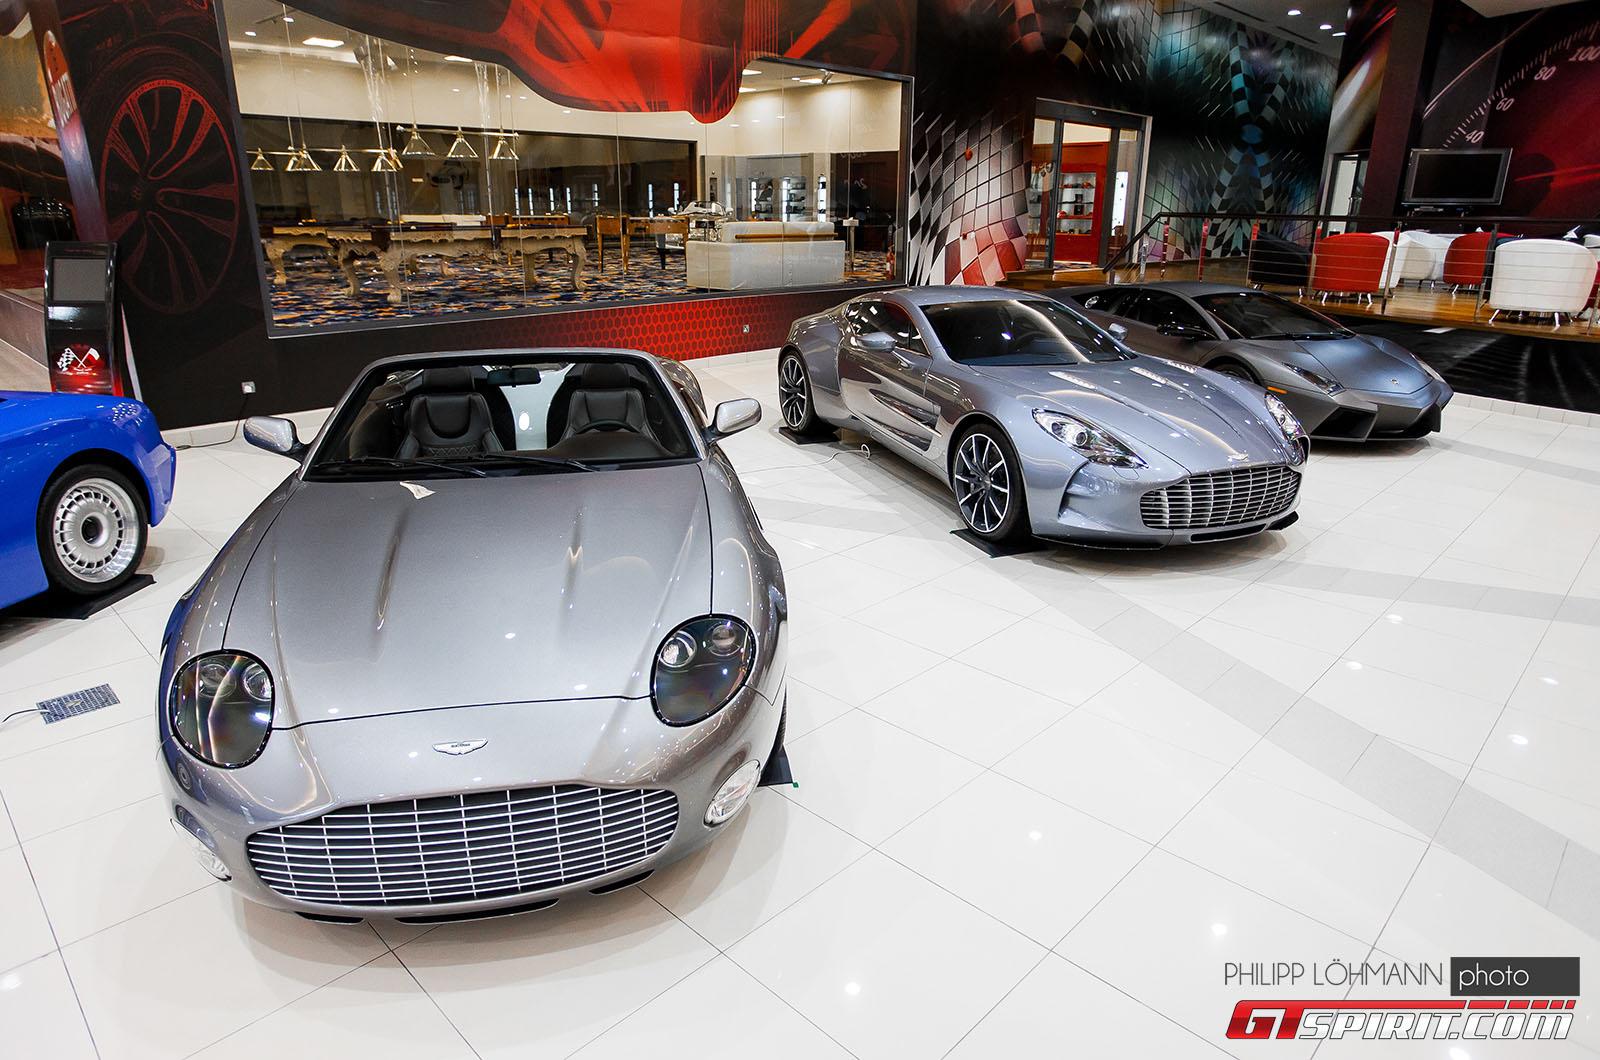 Гараж мечты в Абу-Даби. Aston Martin DB7